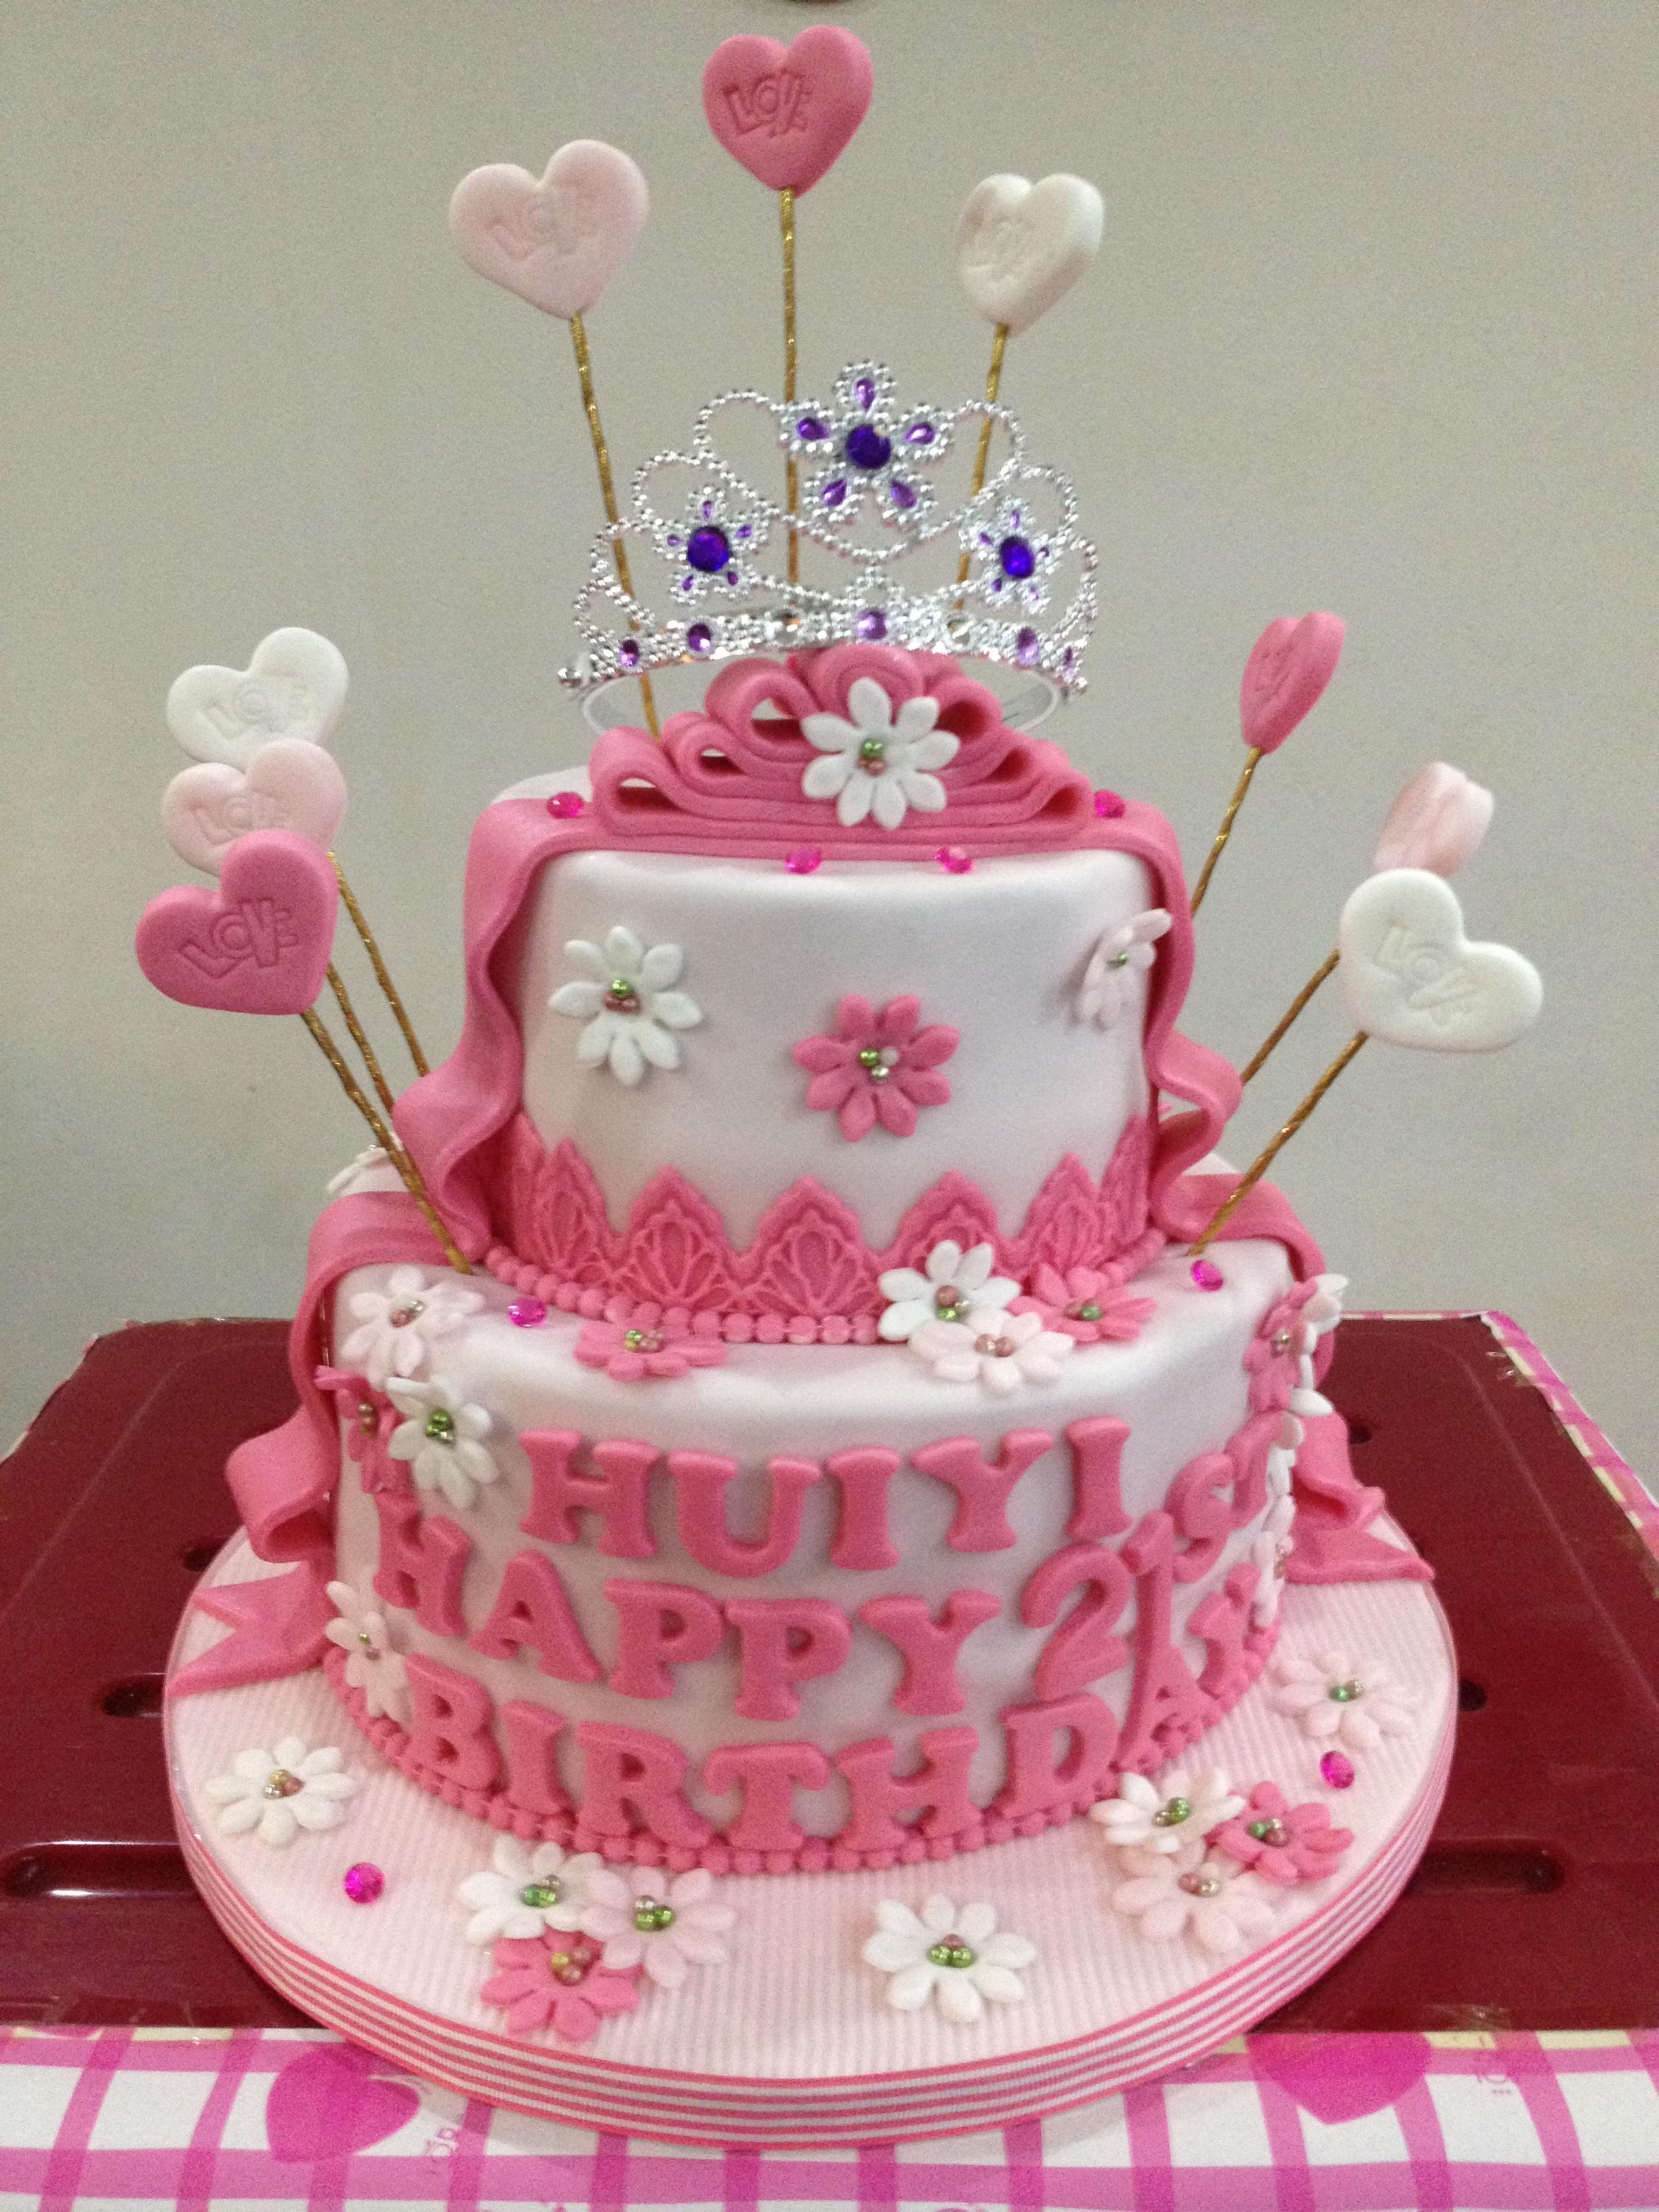 7 Massive Birthday Cakes Photo Candy Themed Cake Huge Birthday